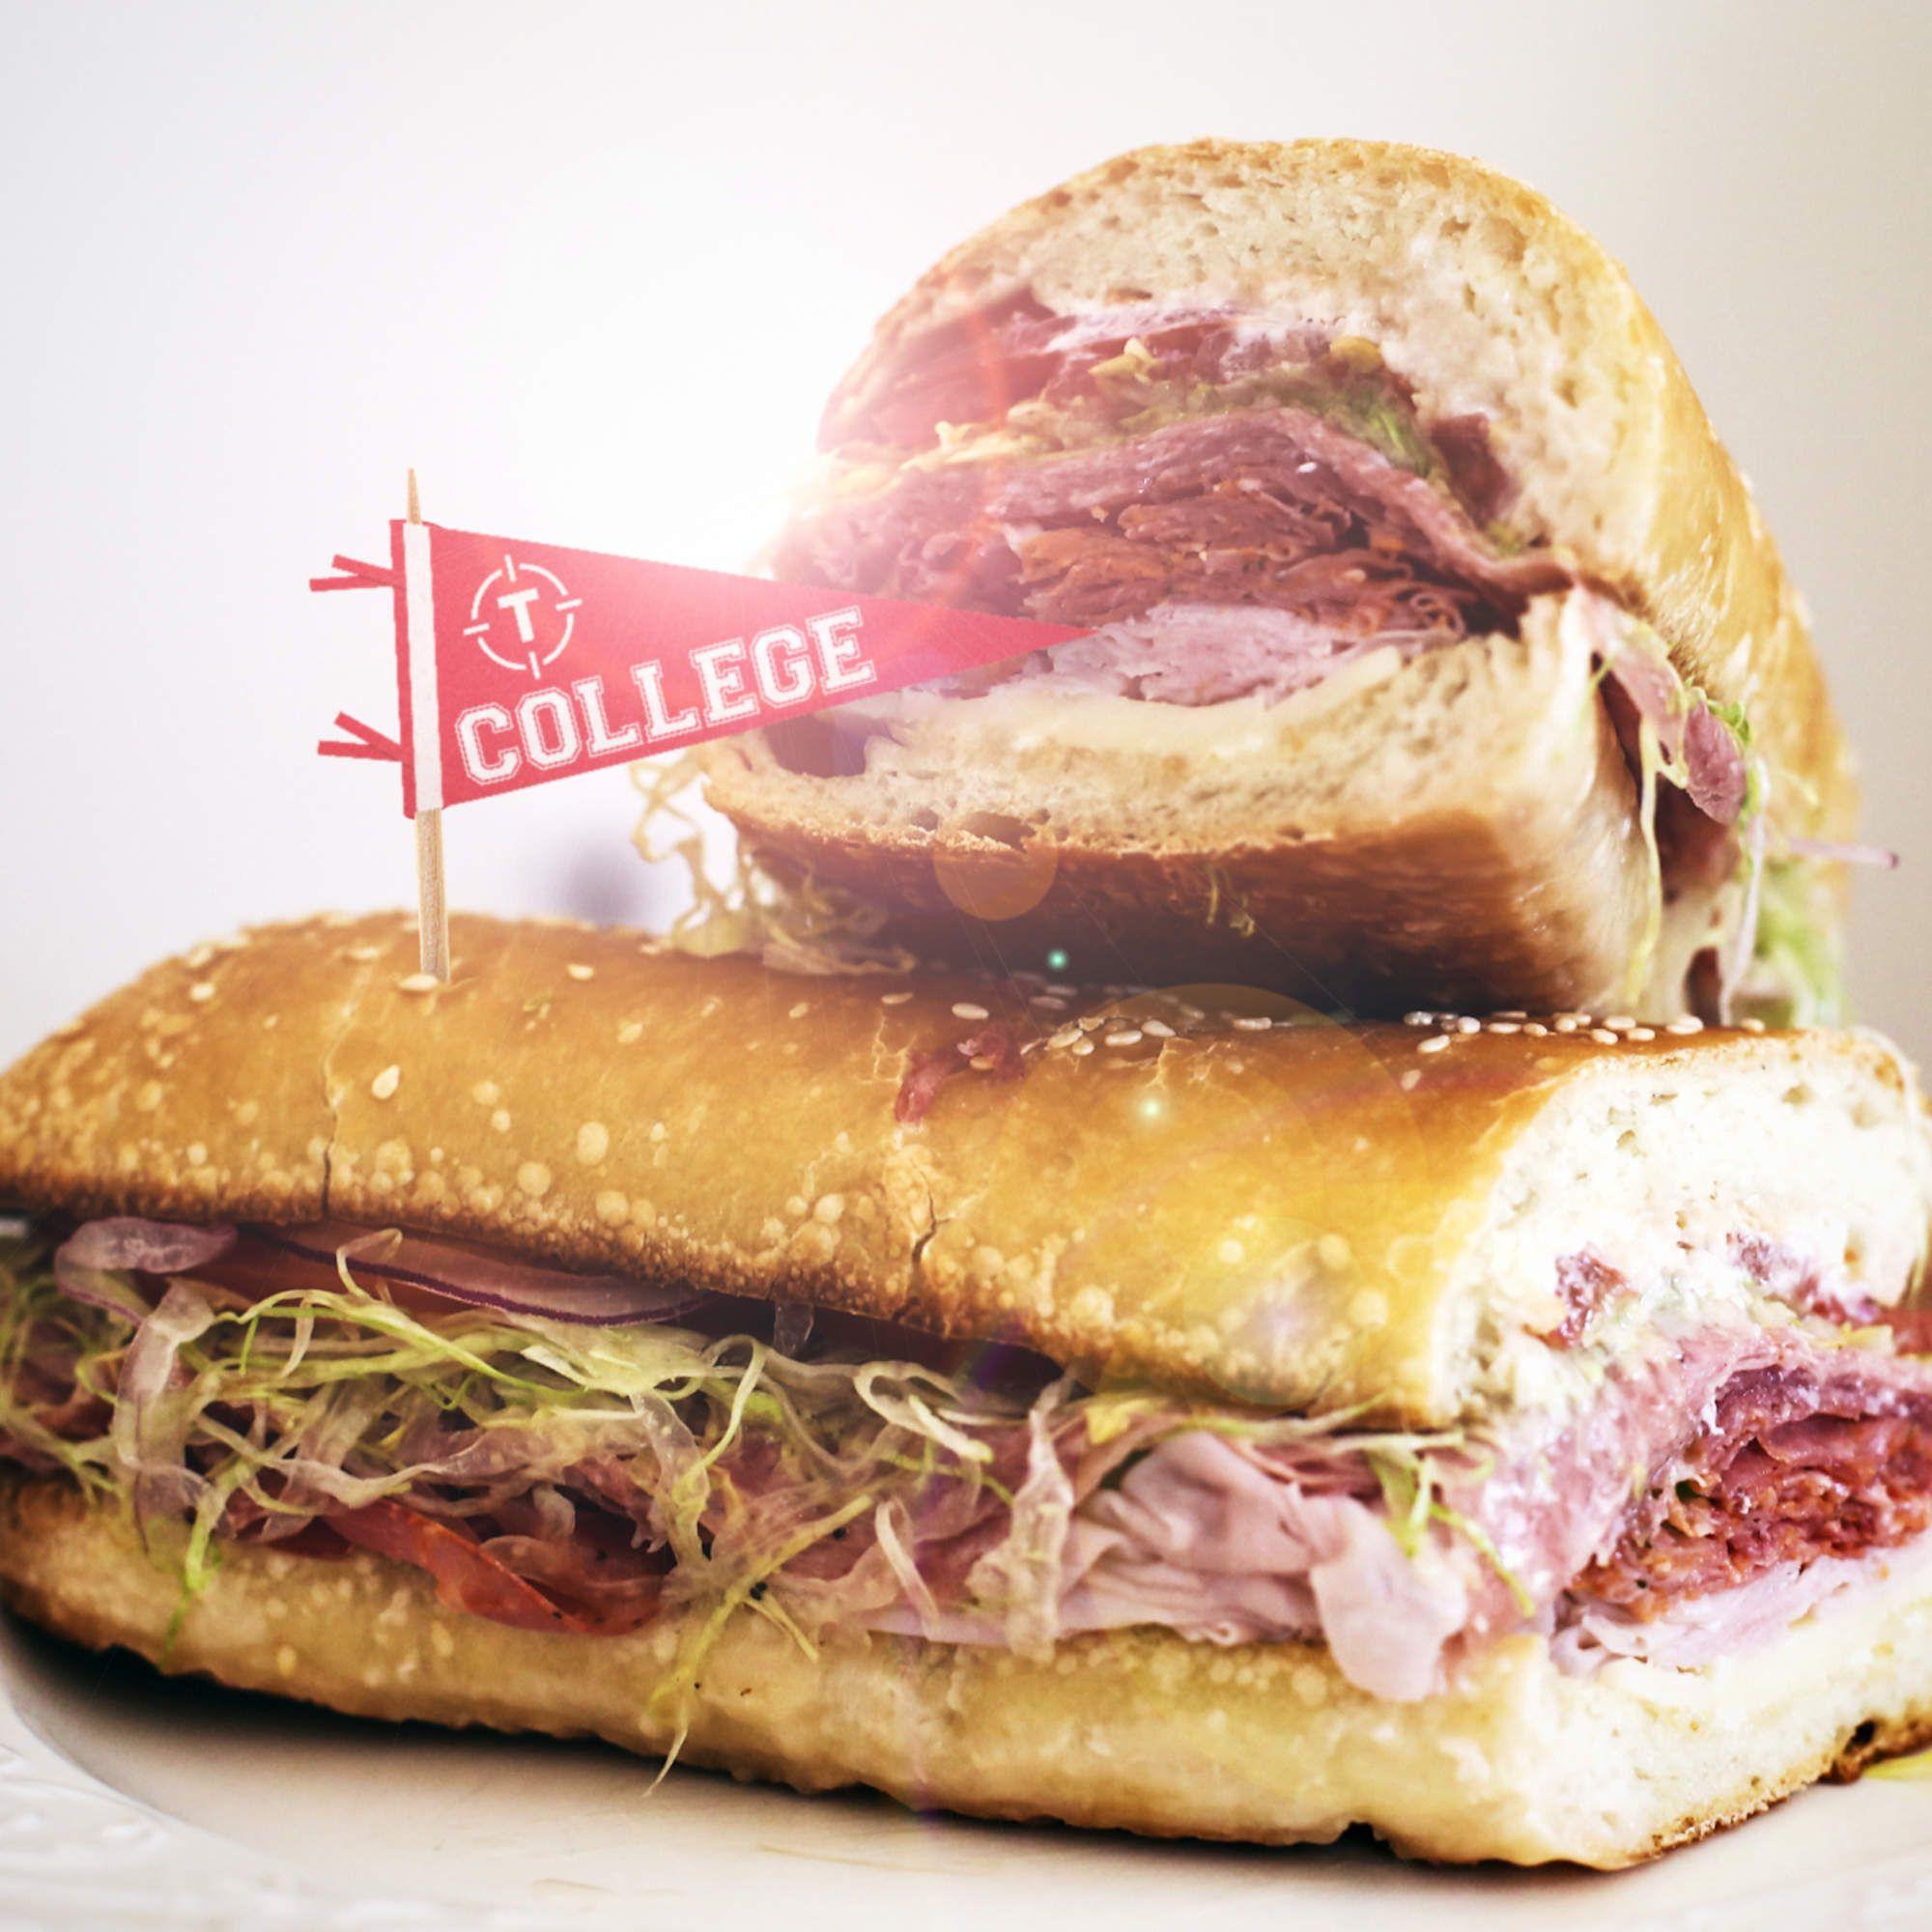 White apron sandwiches dc menu - The 30 Best College Sandwich Shops In America